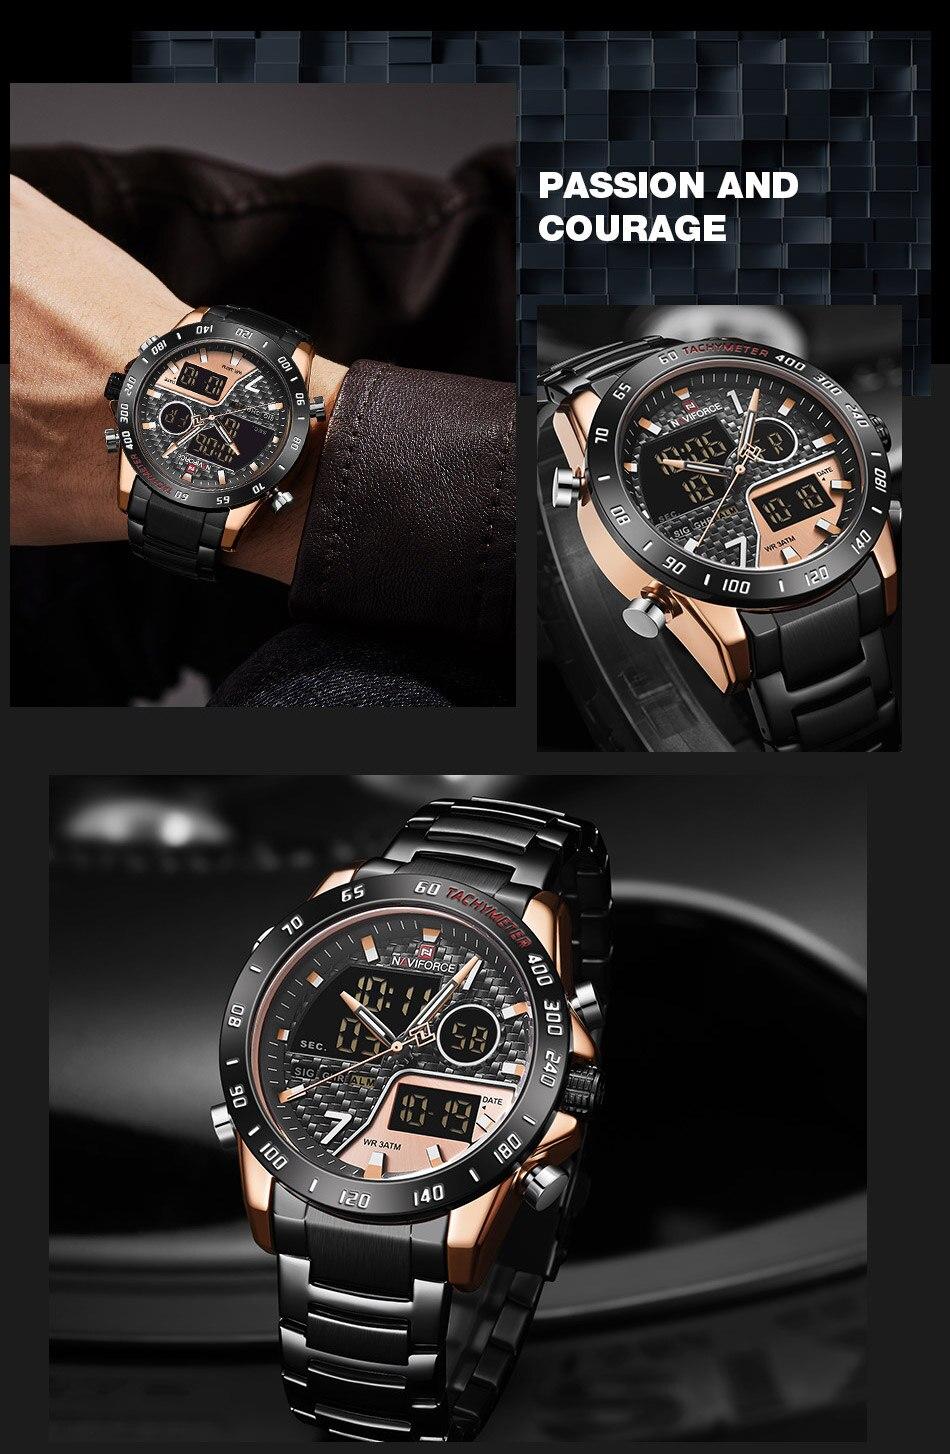 H06f22722f58e4ca5abe26f65662c4f46y NAVIFORCE Men Digital Watch LED Sport Military Mens Quartz Wristwatch Male Luminous Waterproof Clock Watches Relogio Masculino